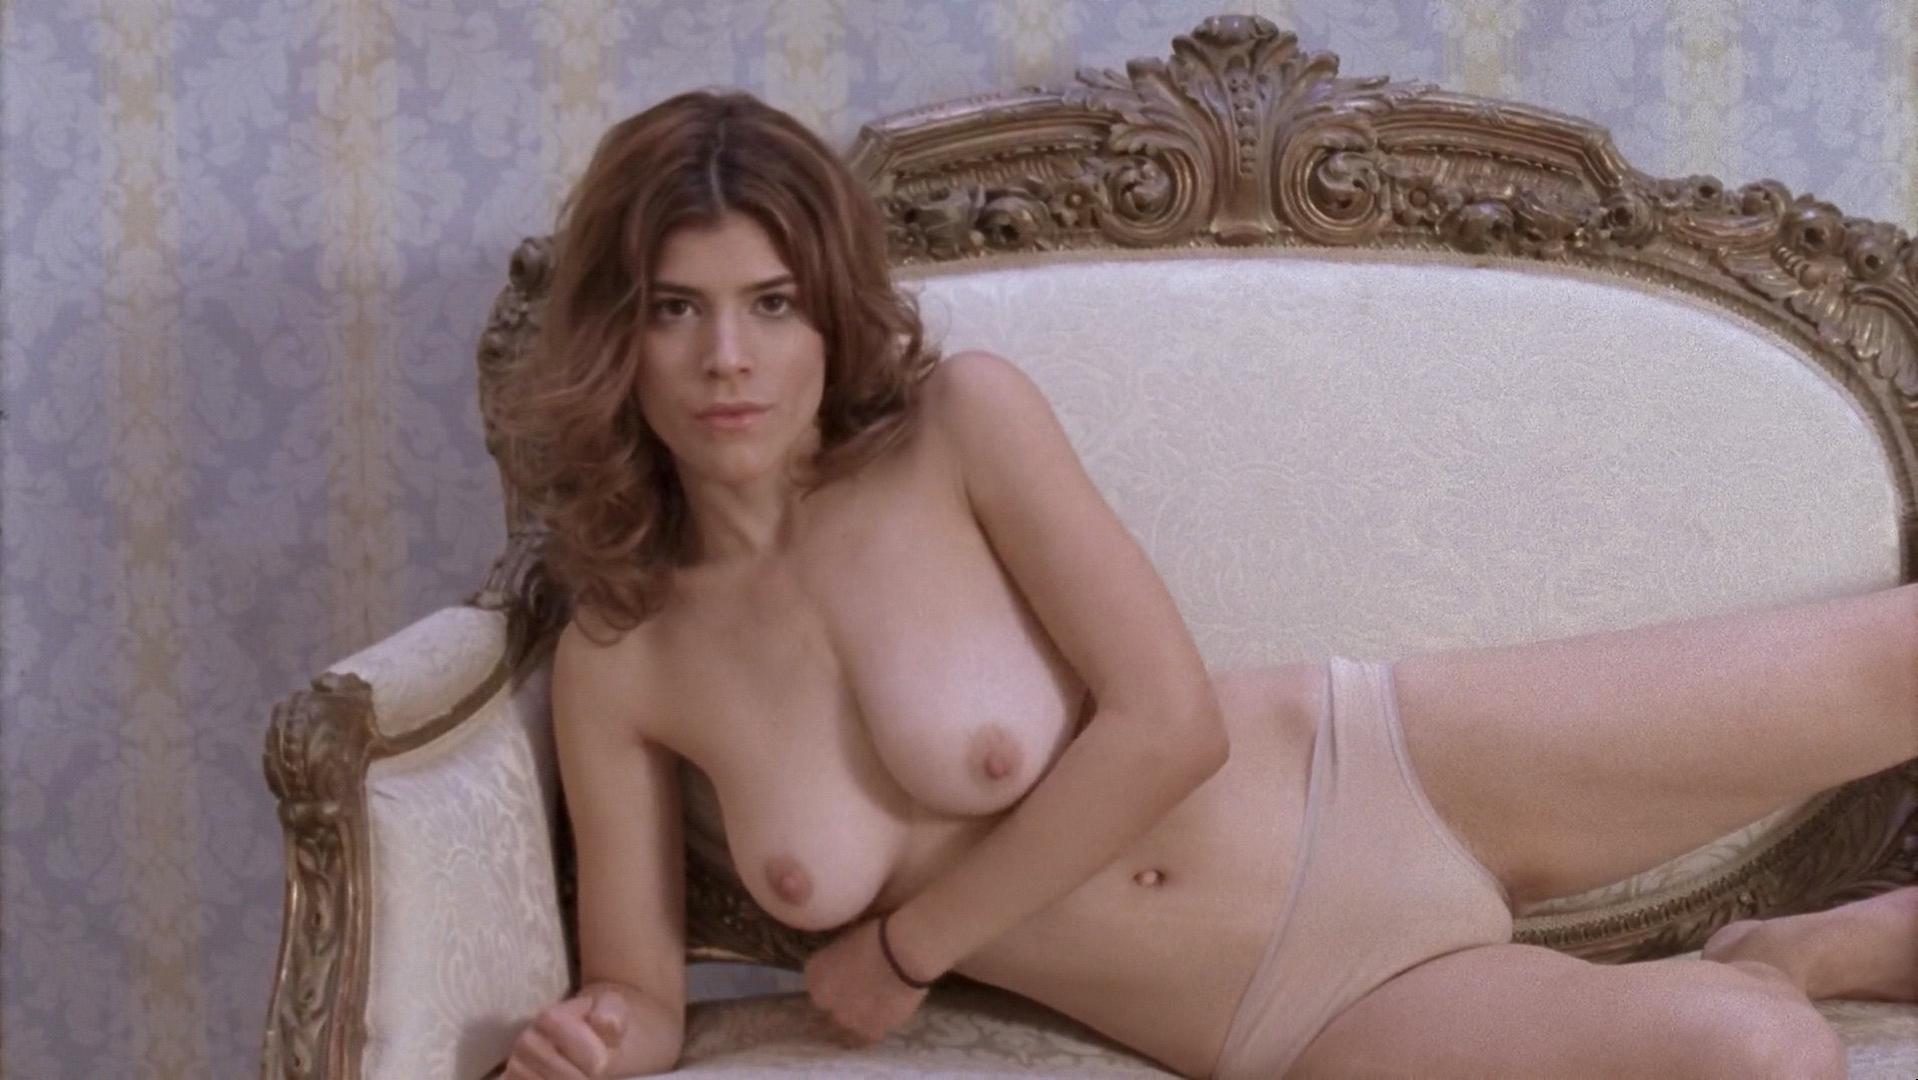 Robin Sydney nude, Shelley Dowdy sexy - Garden Party (2008)